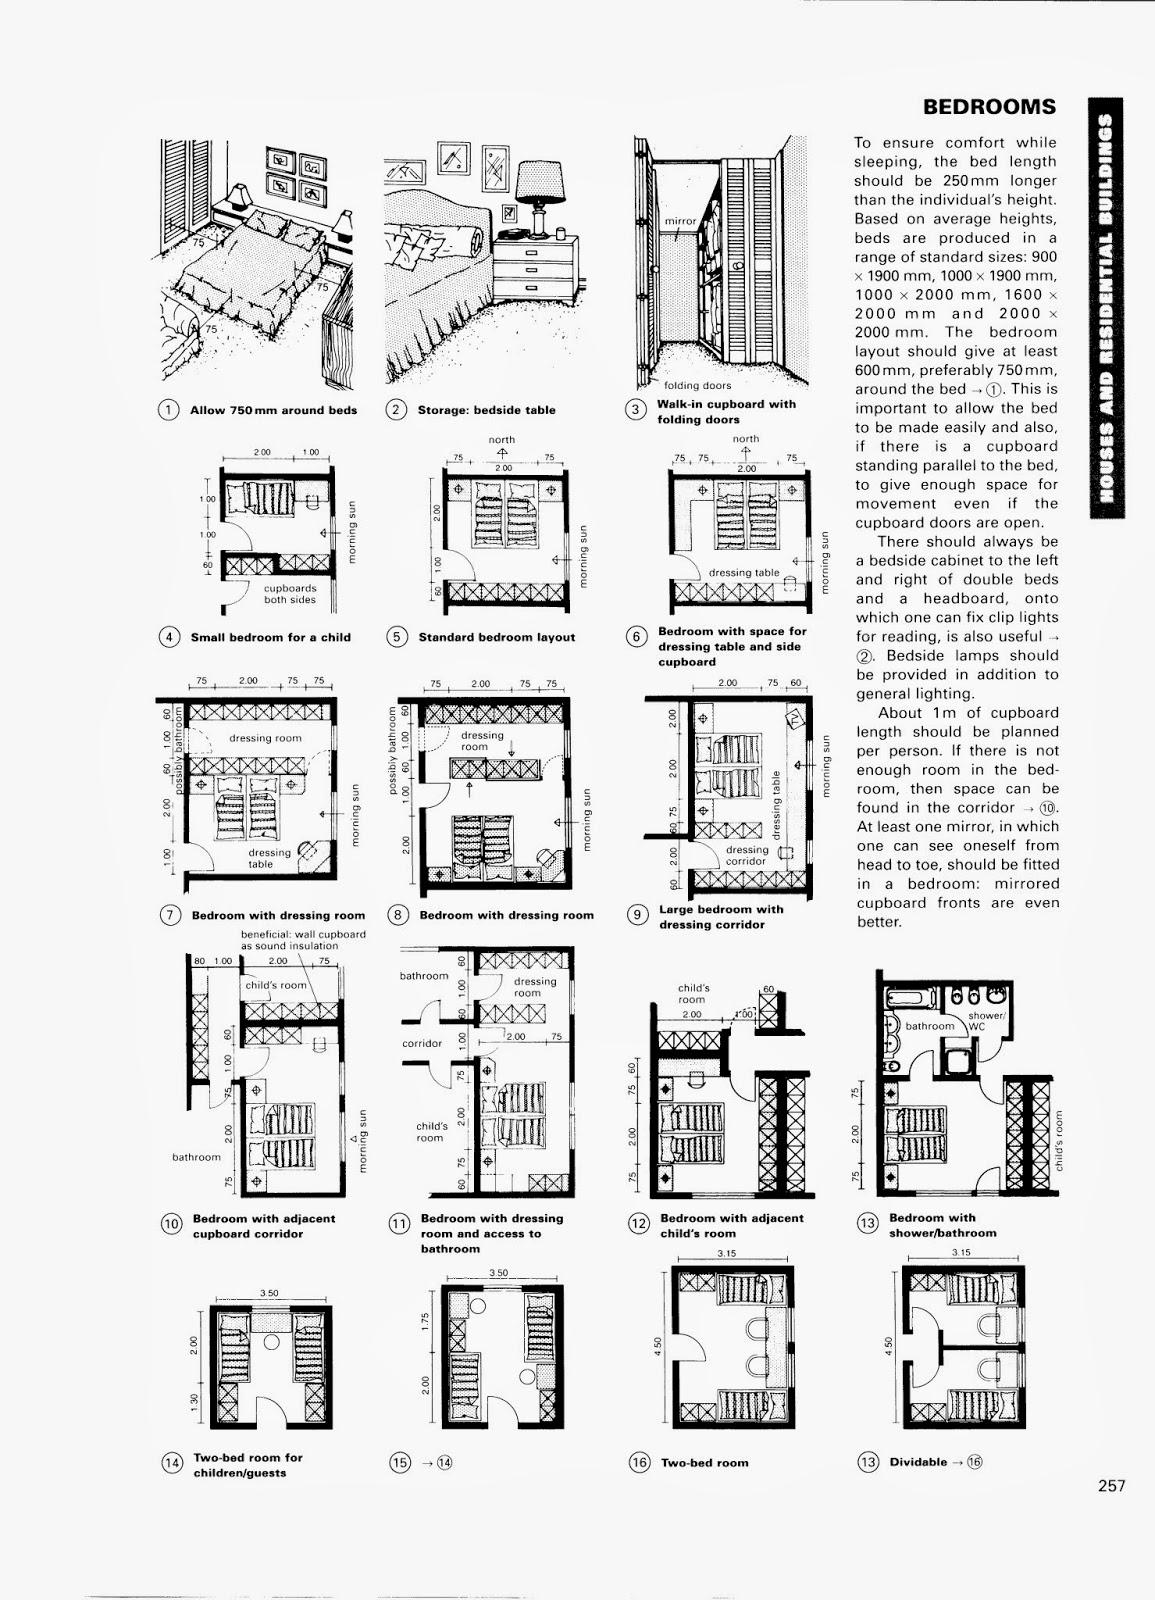 arpl2000: size + scale, architect's data